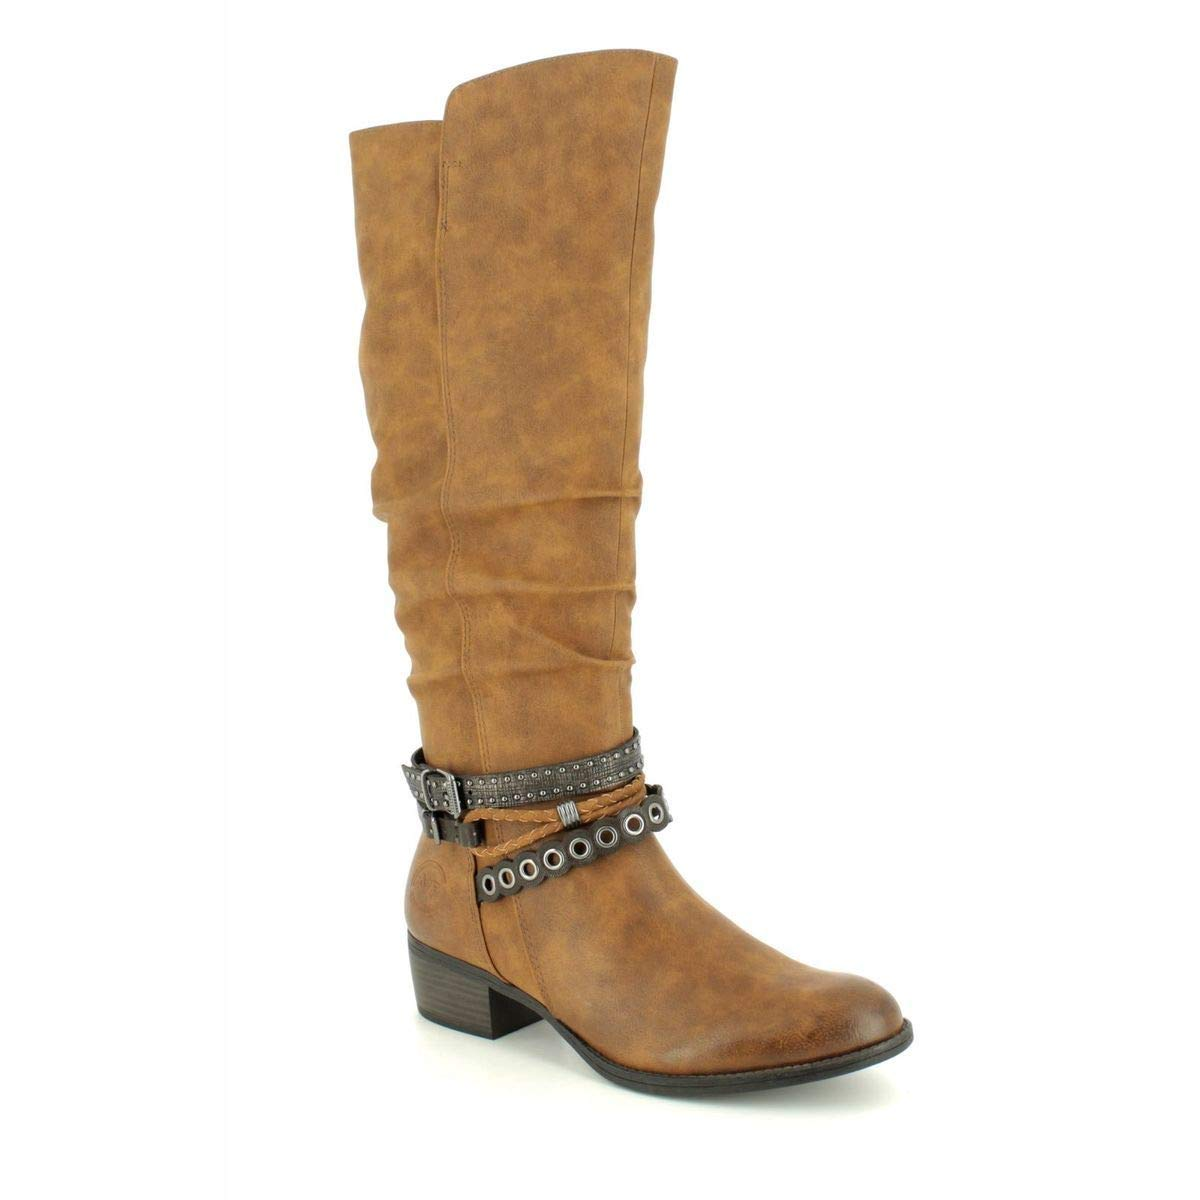 Botte Femmes Chaussures femme 2 21 MARCO TOZZI 25525 wZO0nPkXN8